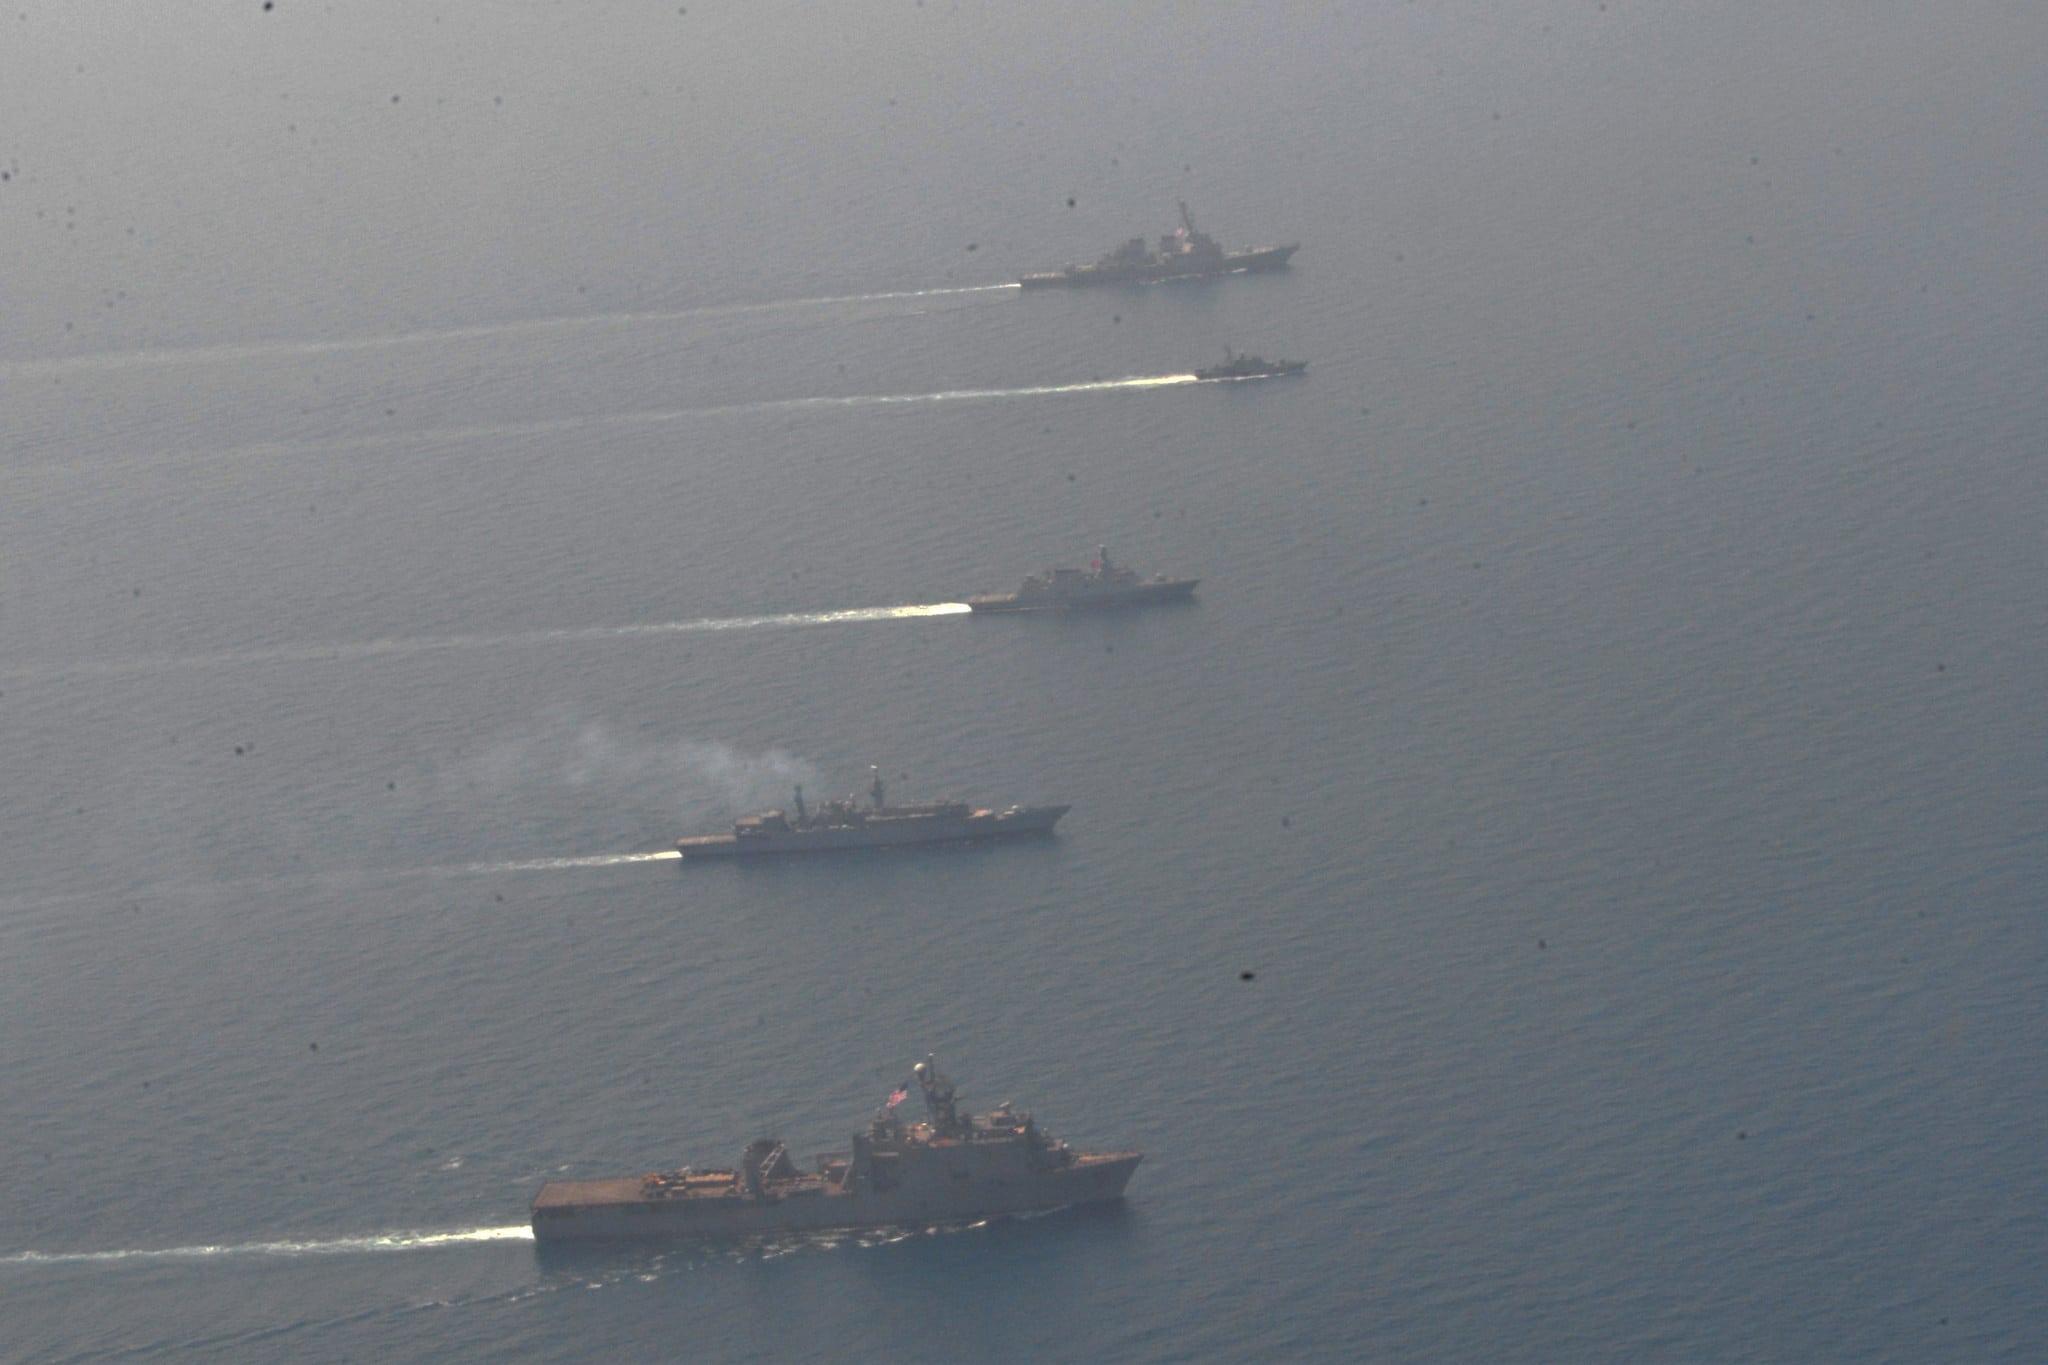 blacksea exercise 2 - naval post